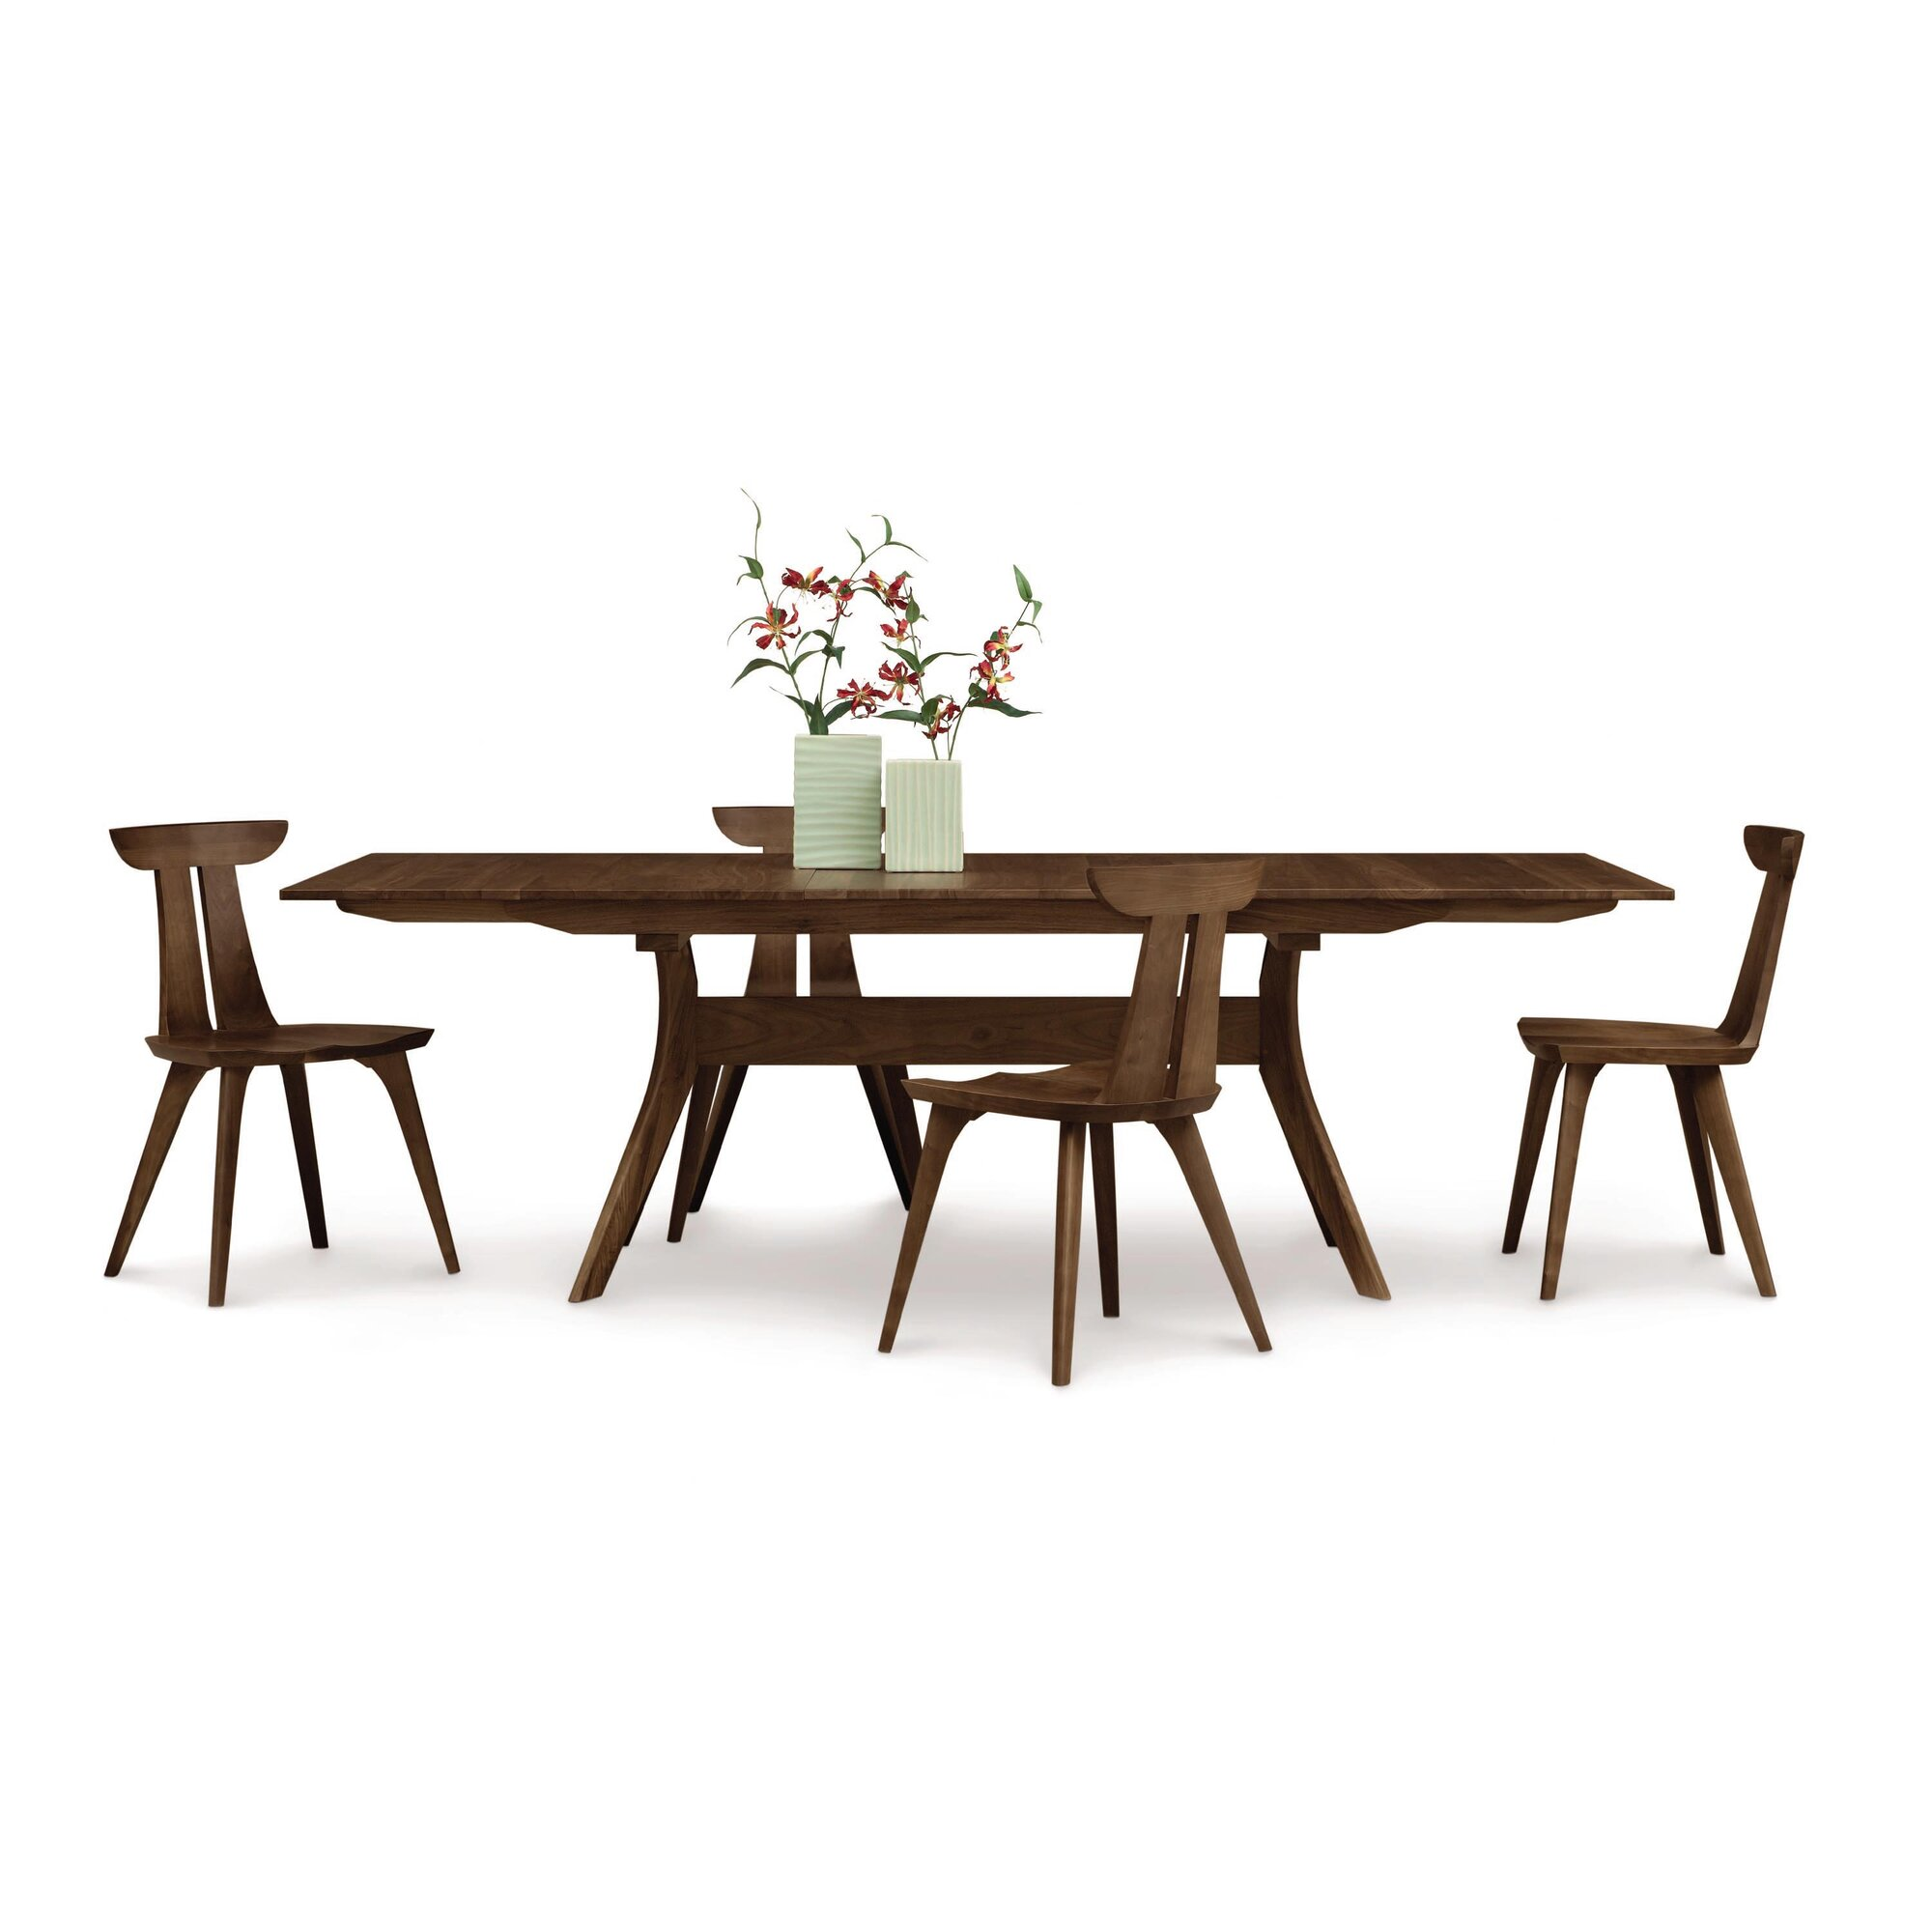 Copeland furniture audrey 7 piece dining set reviews for Furniture 7 credit reviews